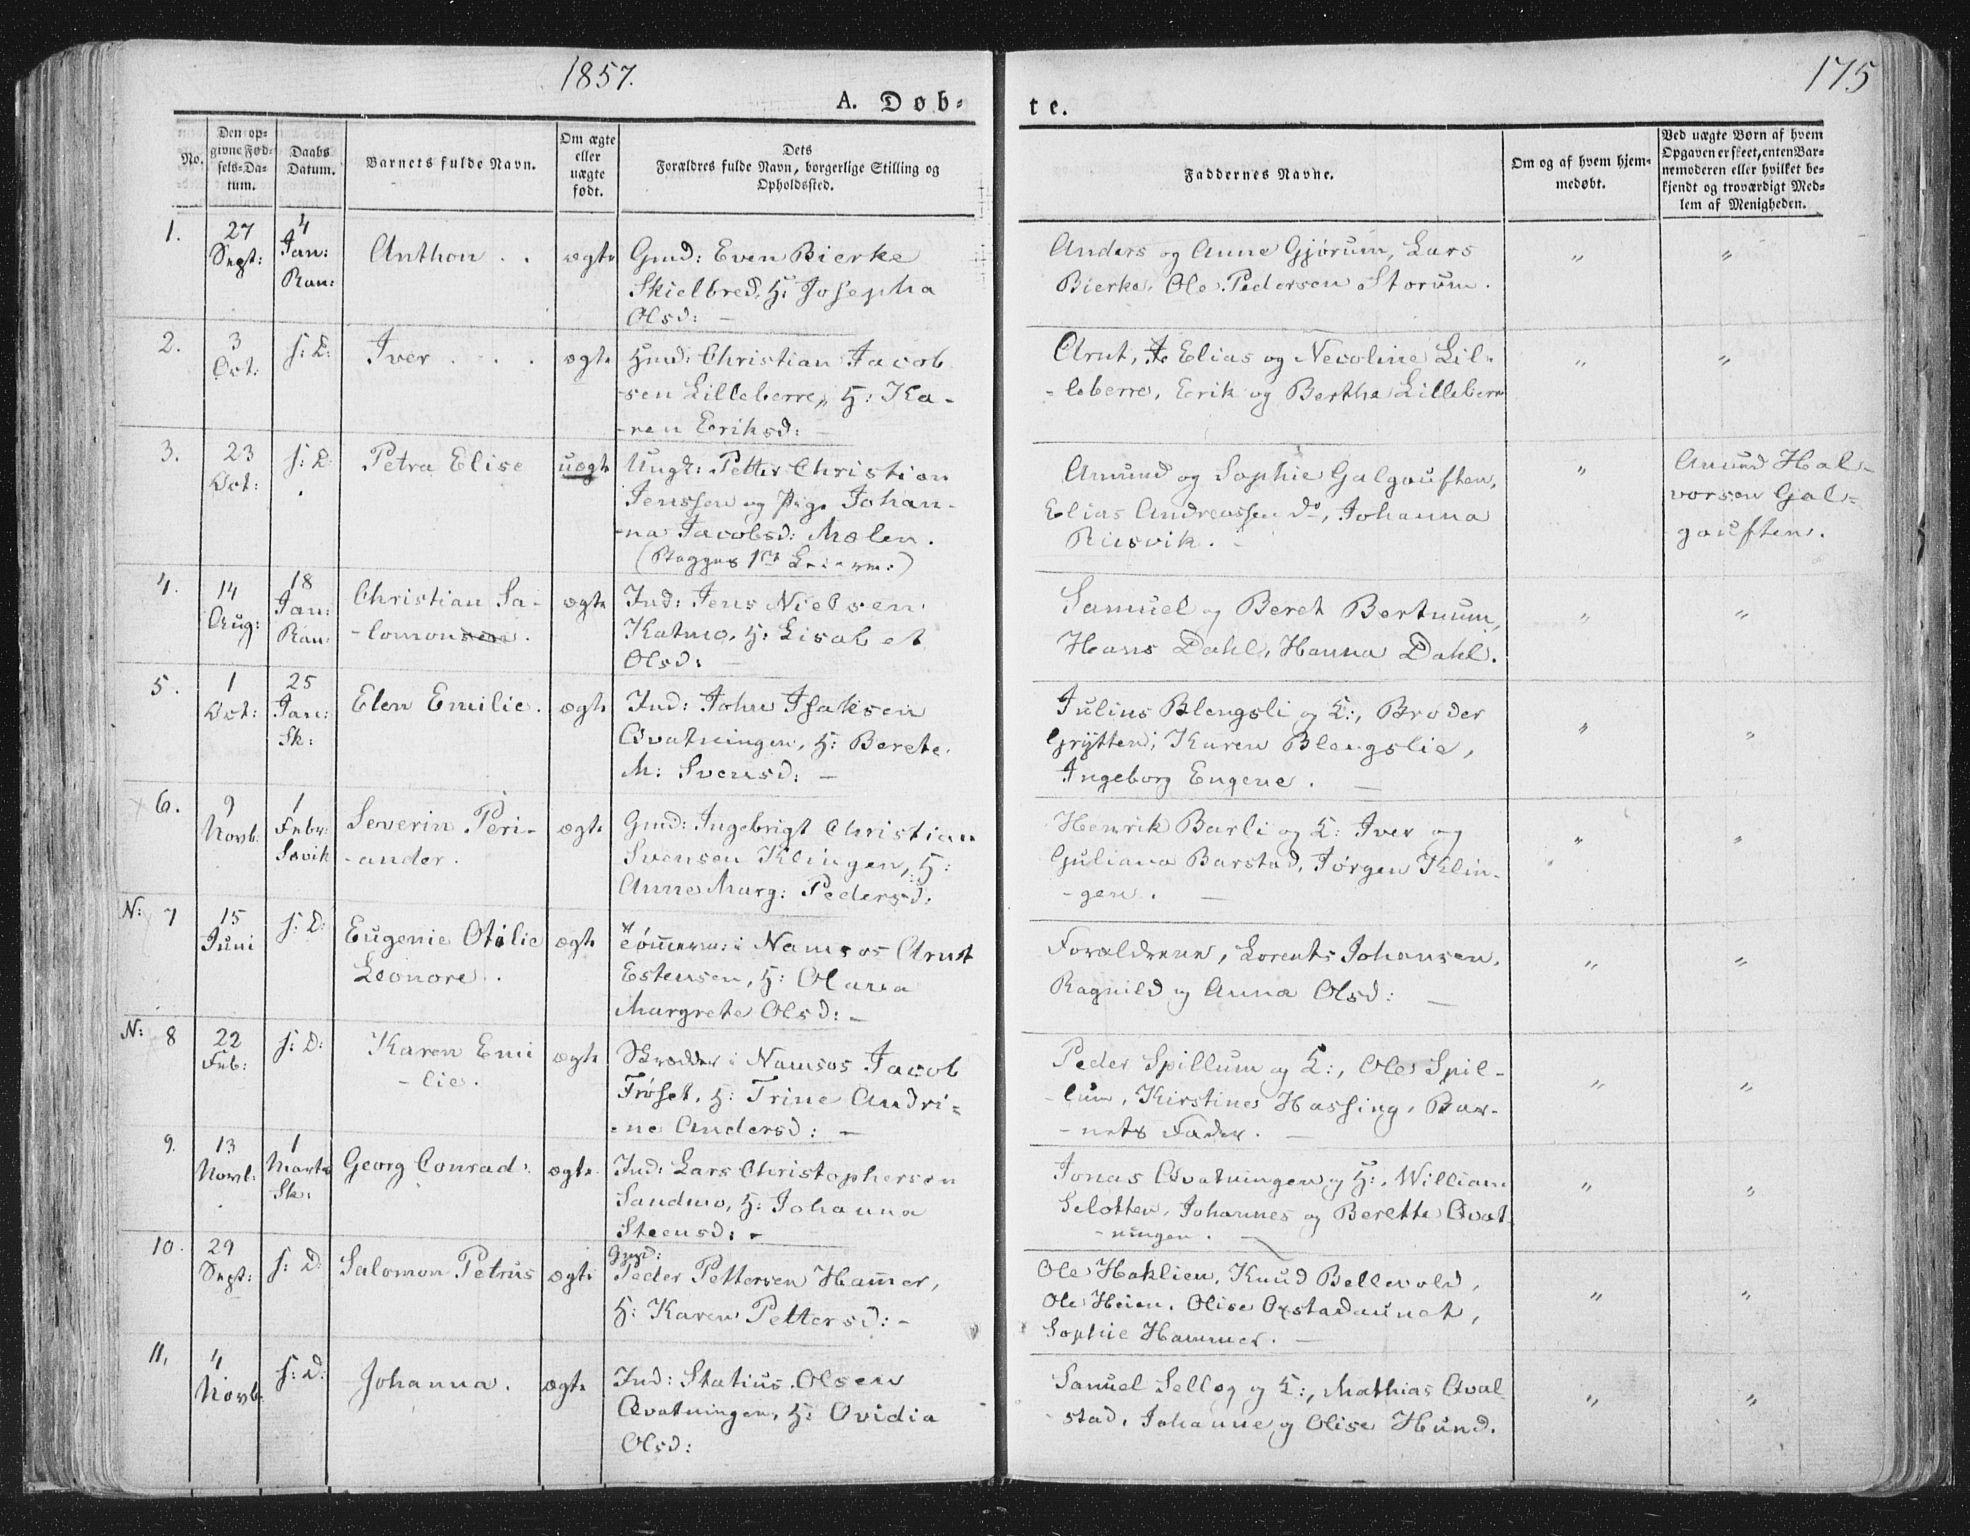 SAT, Ministerialprotokoller, klokkerbøker og fødselsregistre - Nord-Trøndelag, 764/L0551: Ministerialbok nr. 764A07a, 1824-1864, s. 175